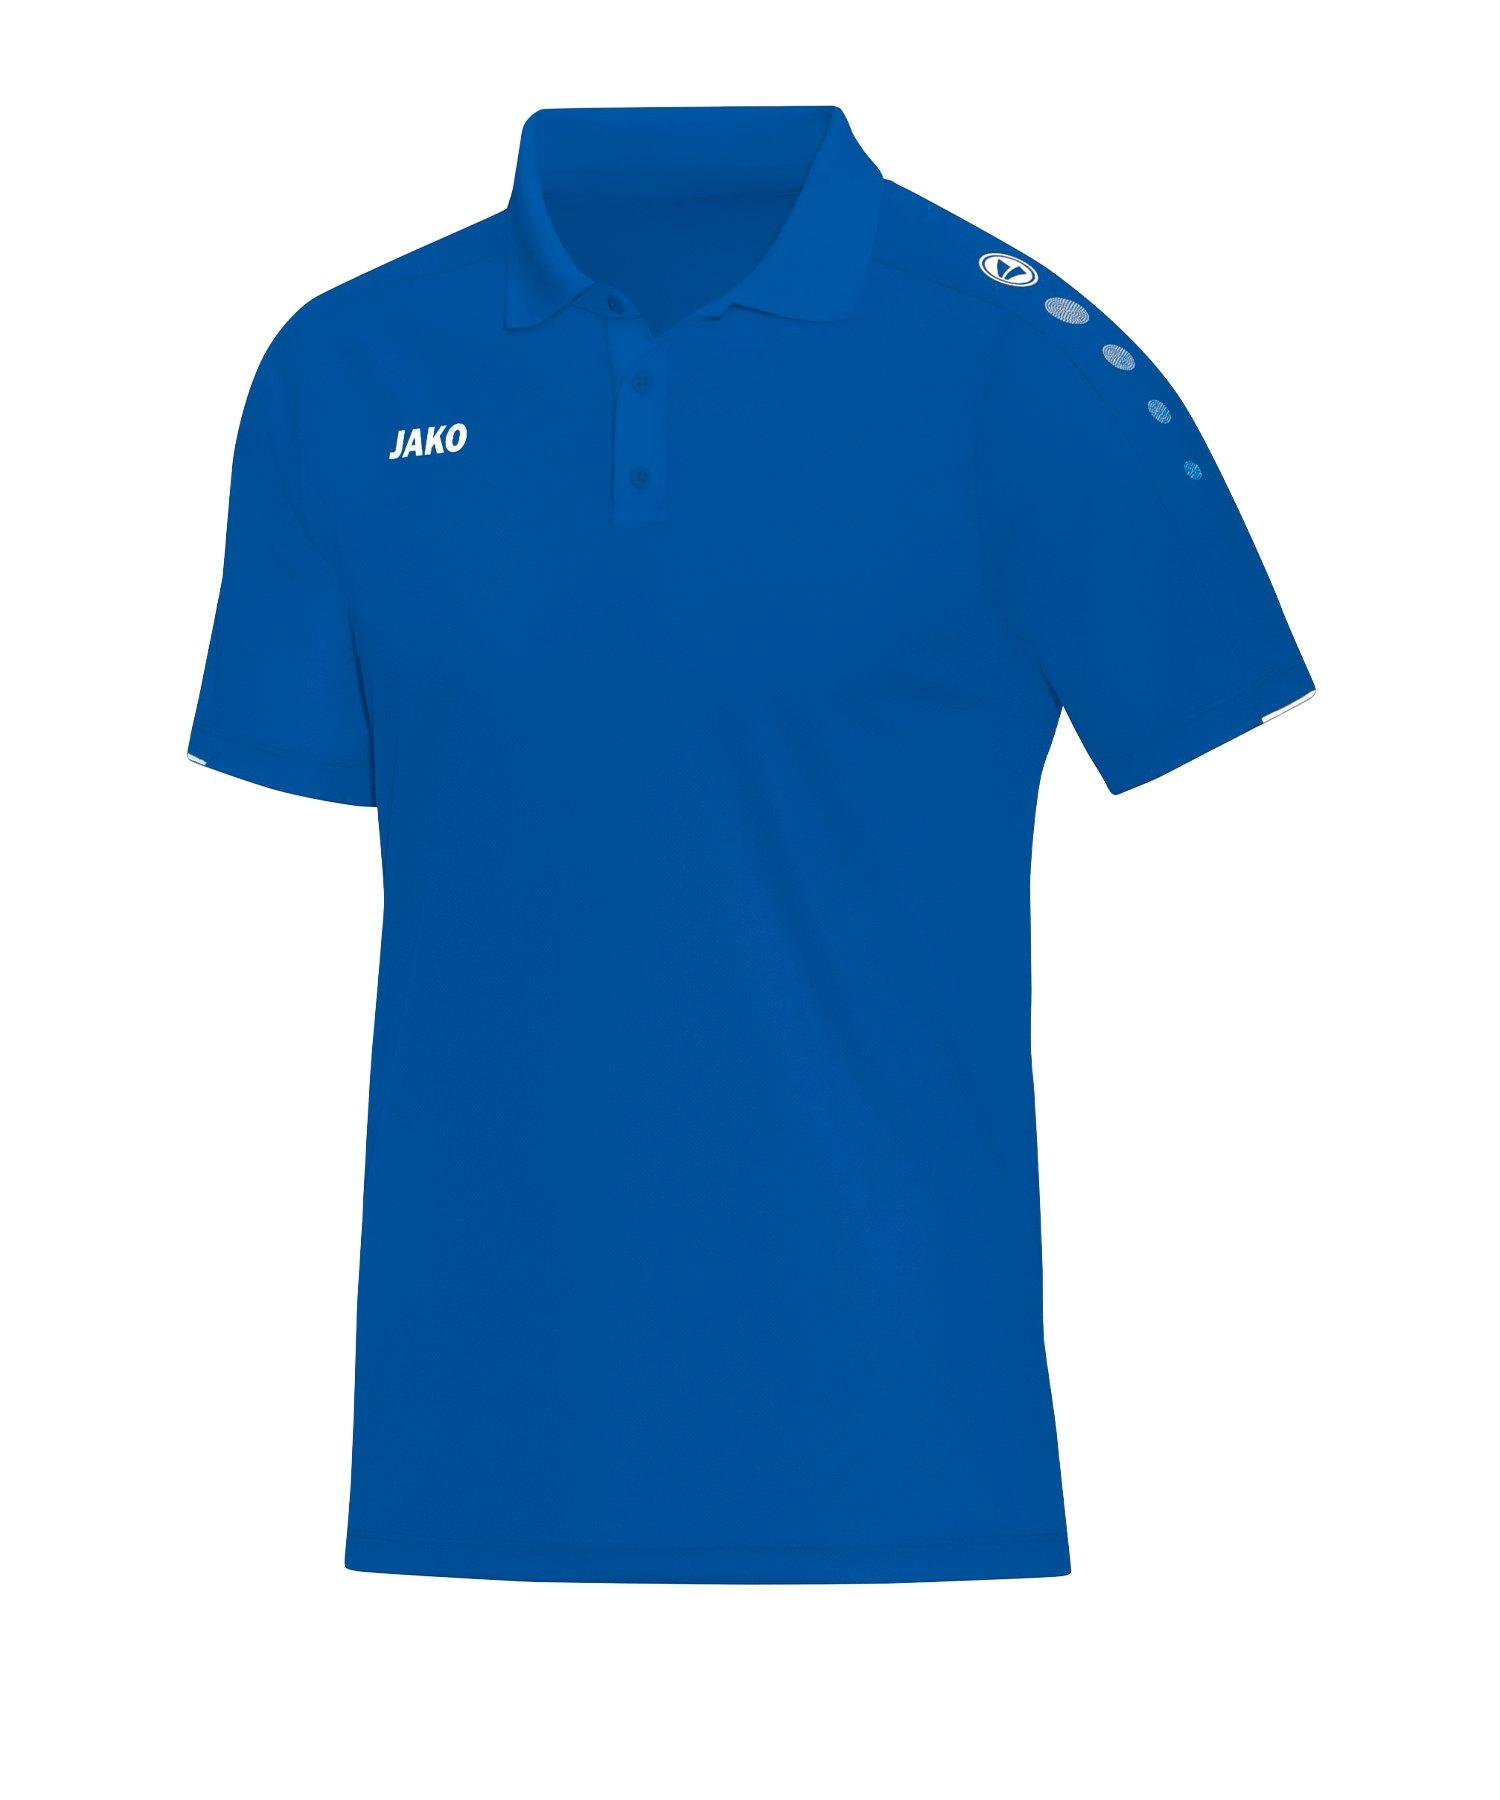 Jako Classico Poloshirt Kids Blau F04 - Blau